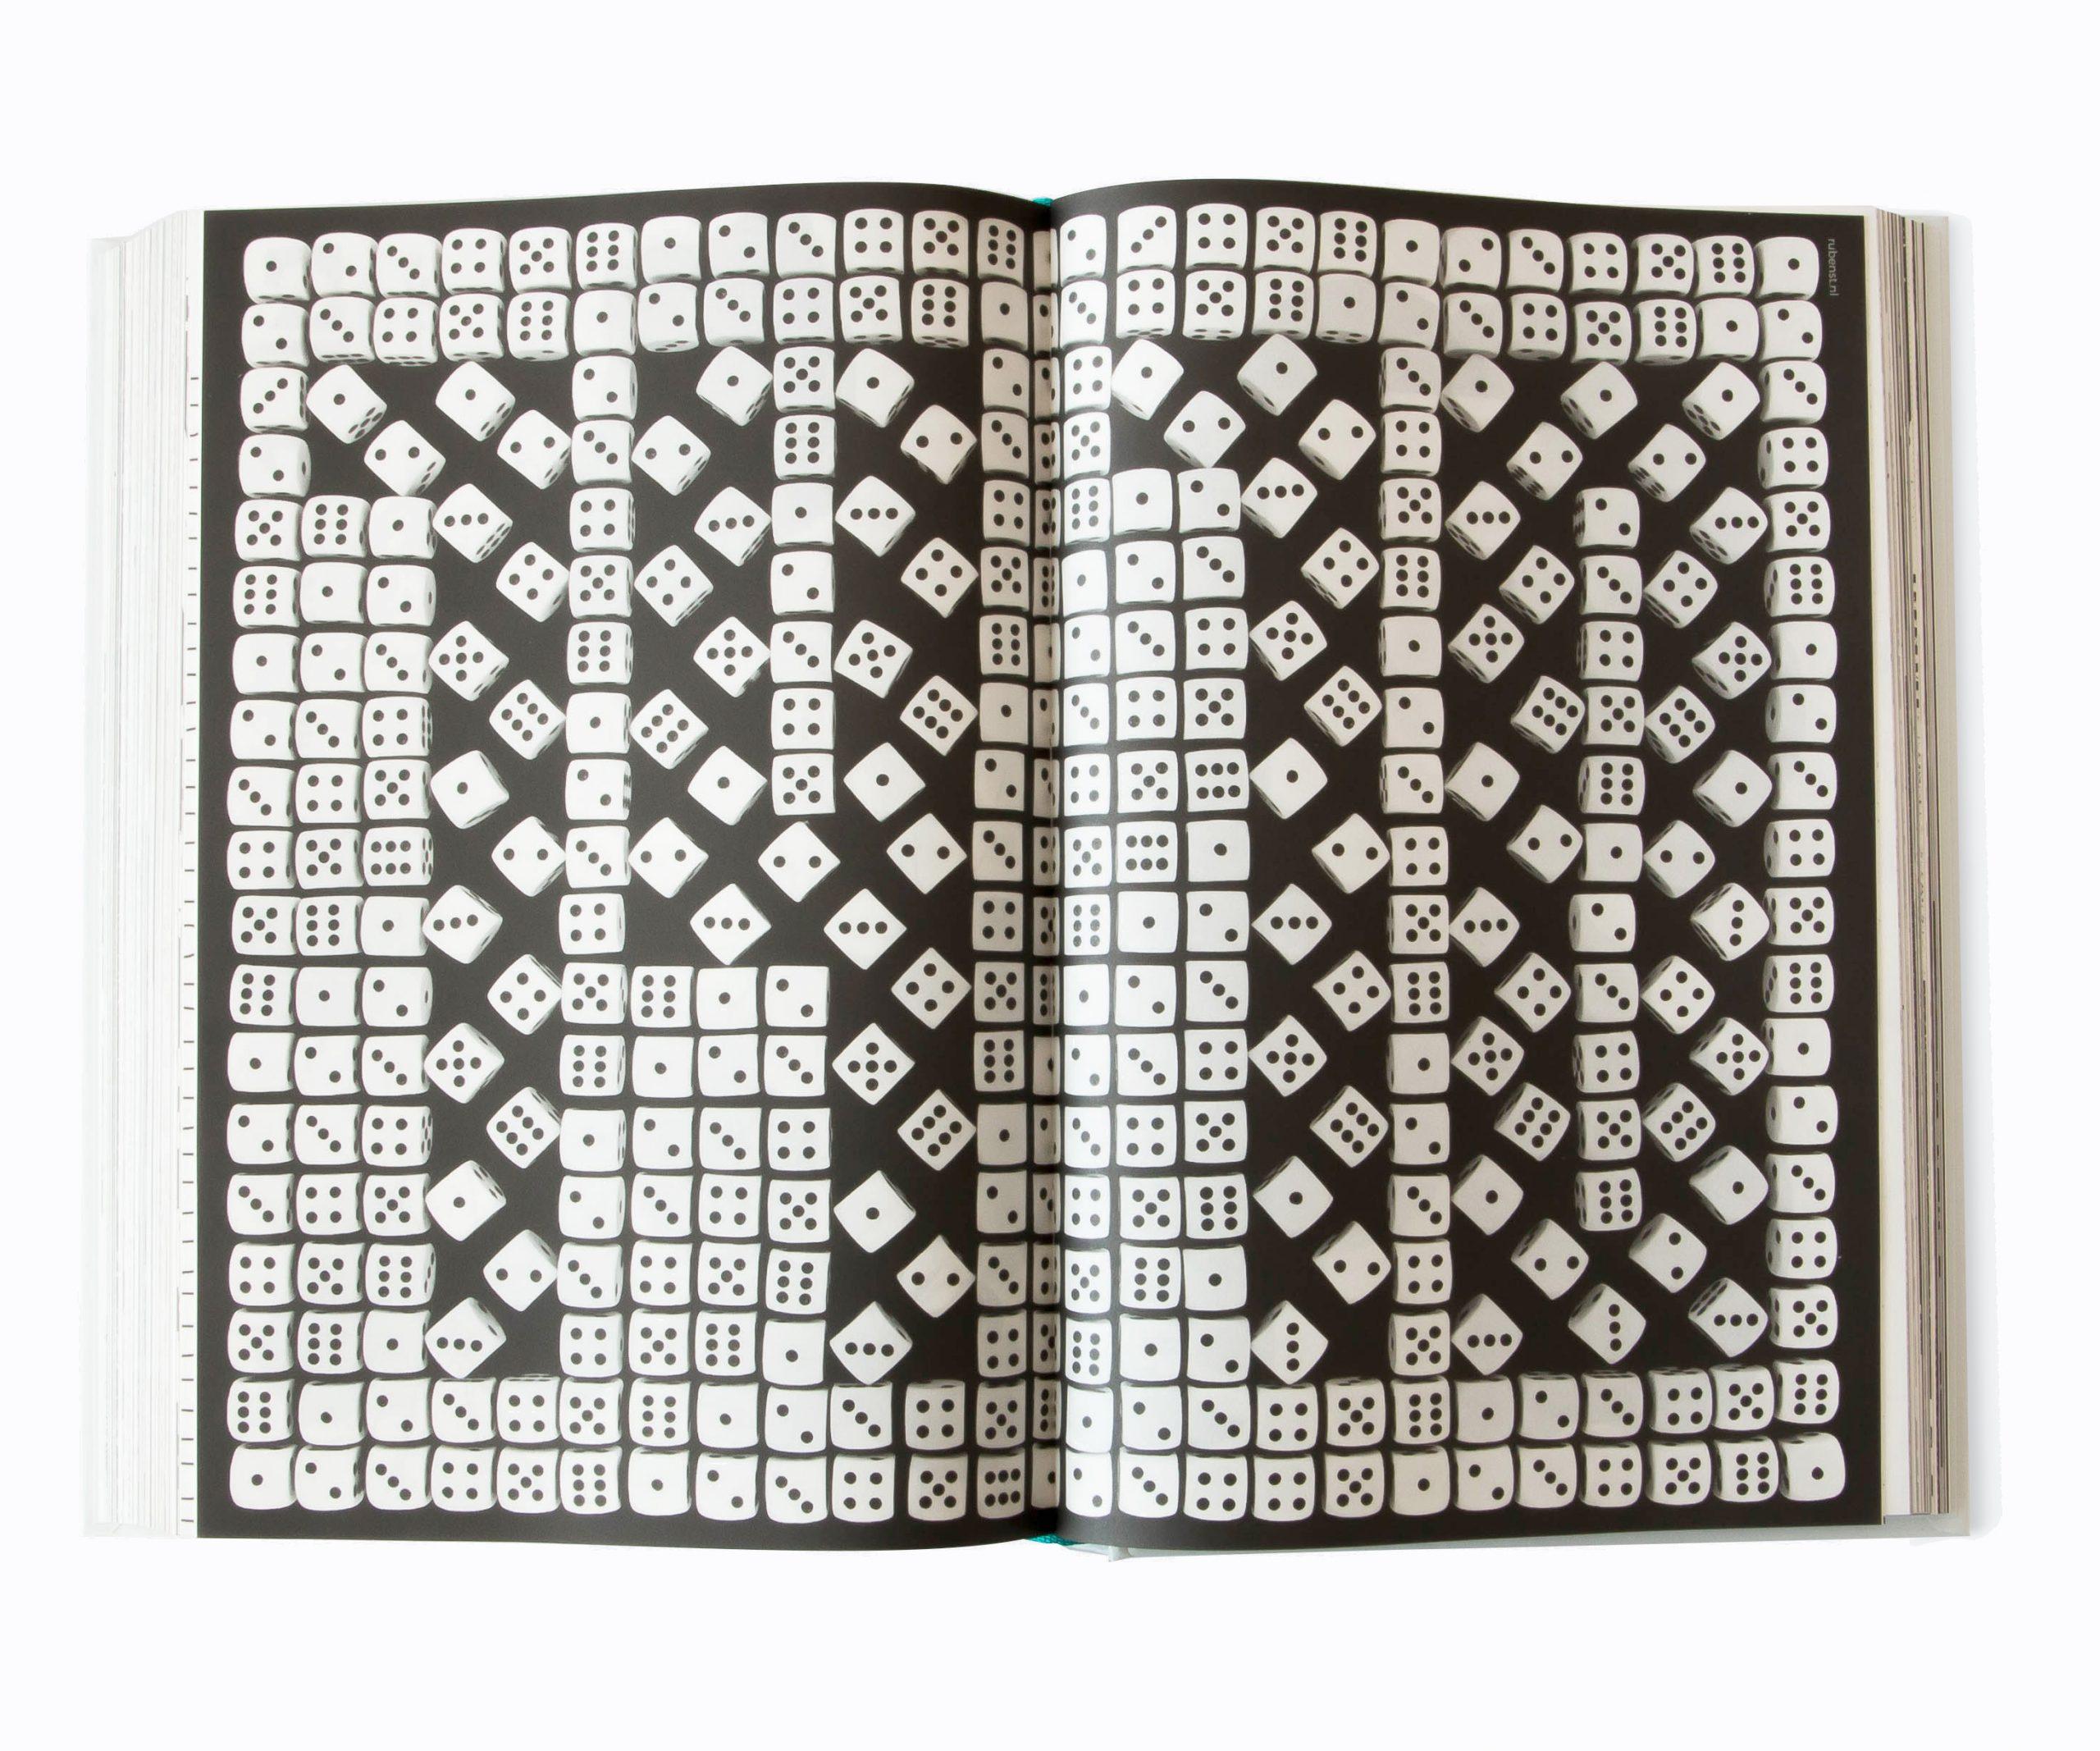 Rubenstelli_Kalenderboek_stichting_print